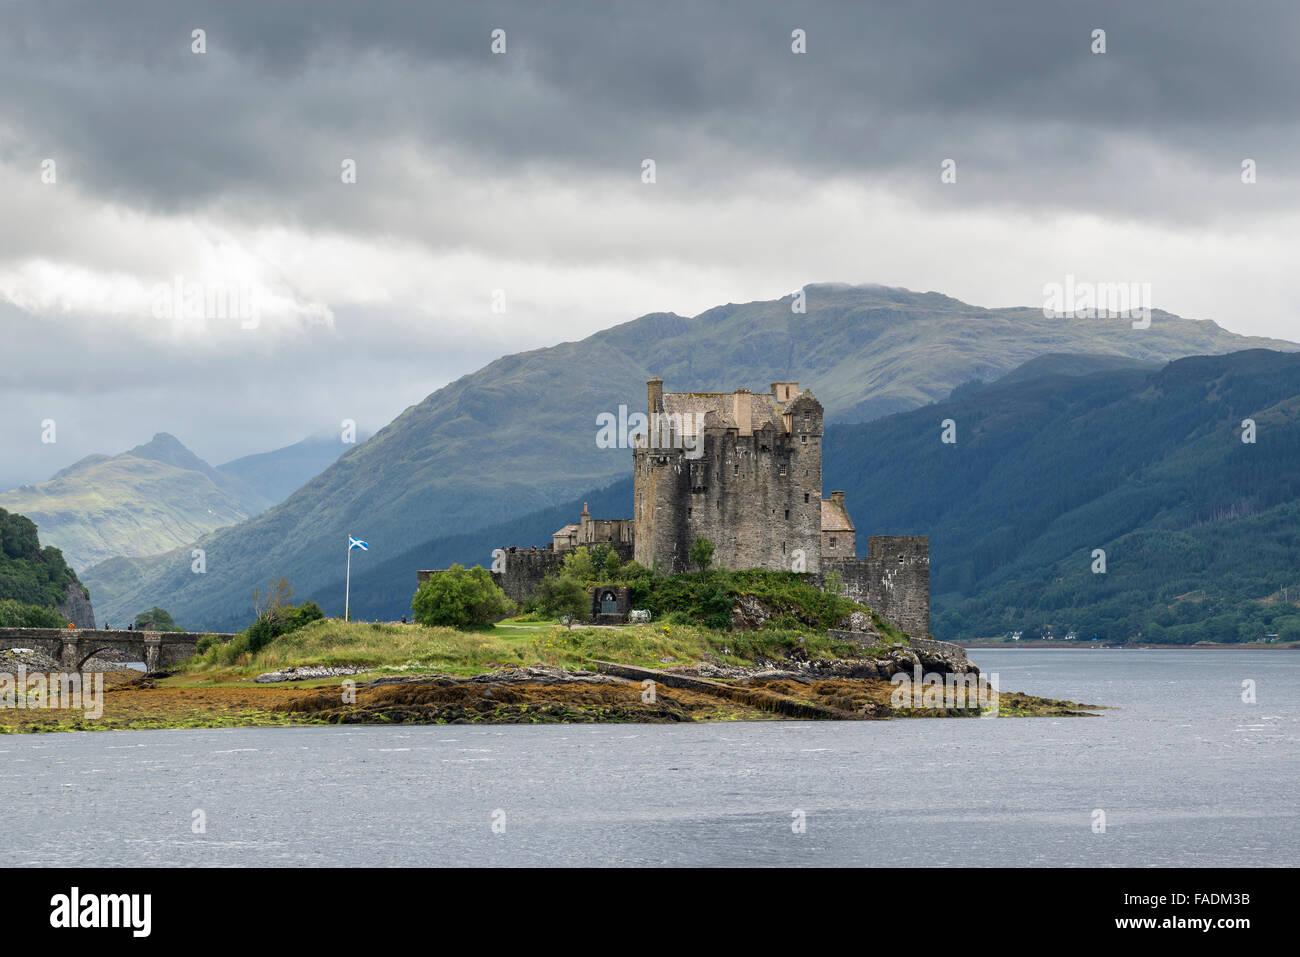 Eilean Donan Castle at Dornie, Western Ross, Scottish Highlands, Scotland, United Kingdom Stock Photo